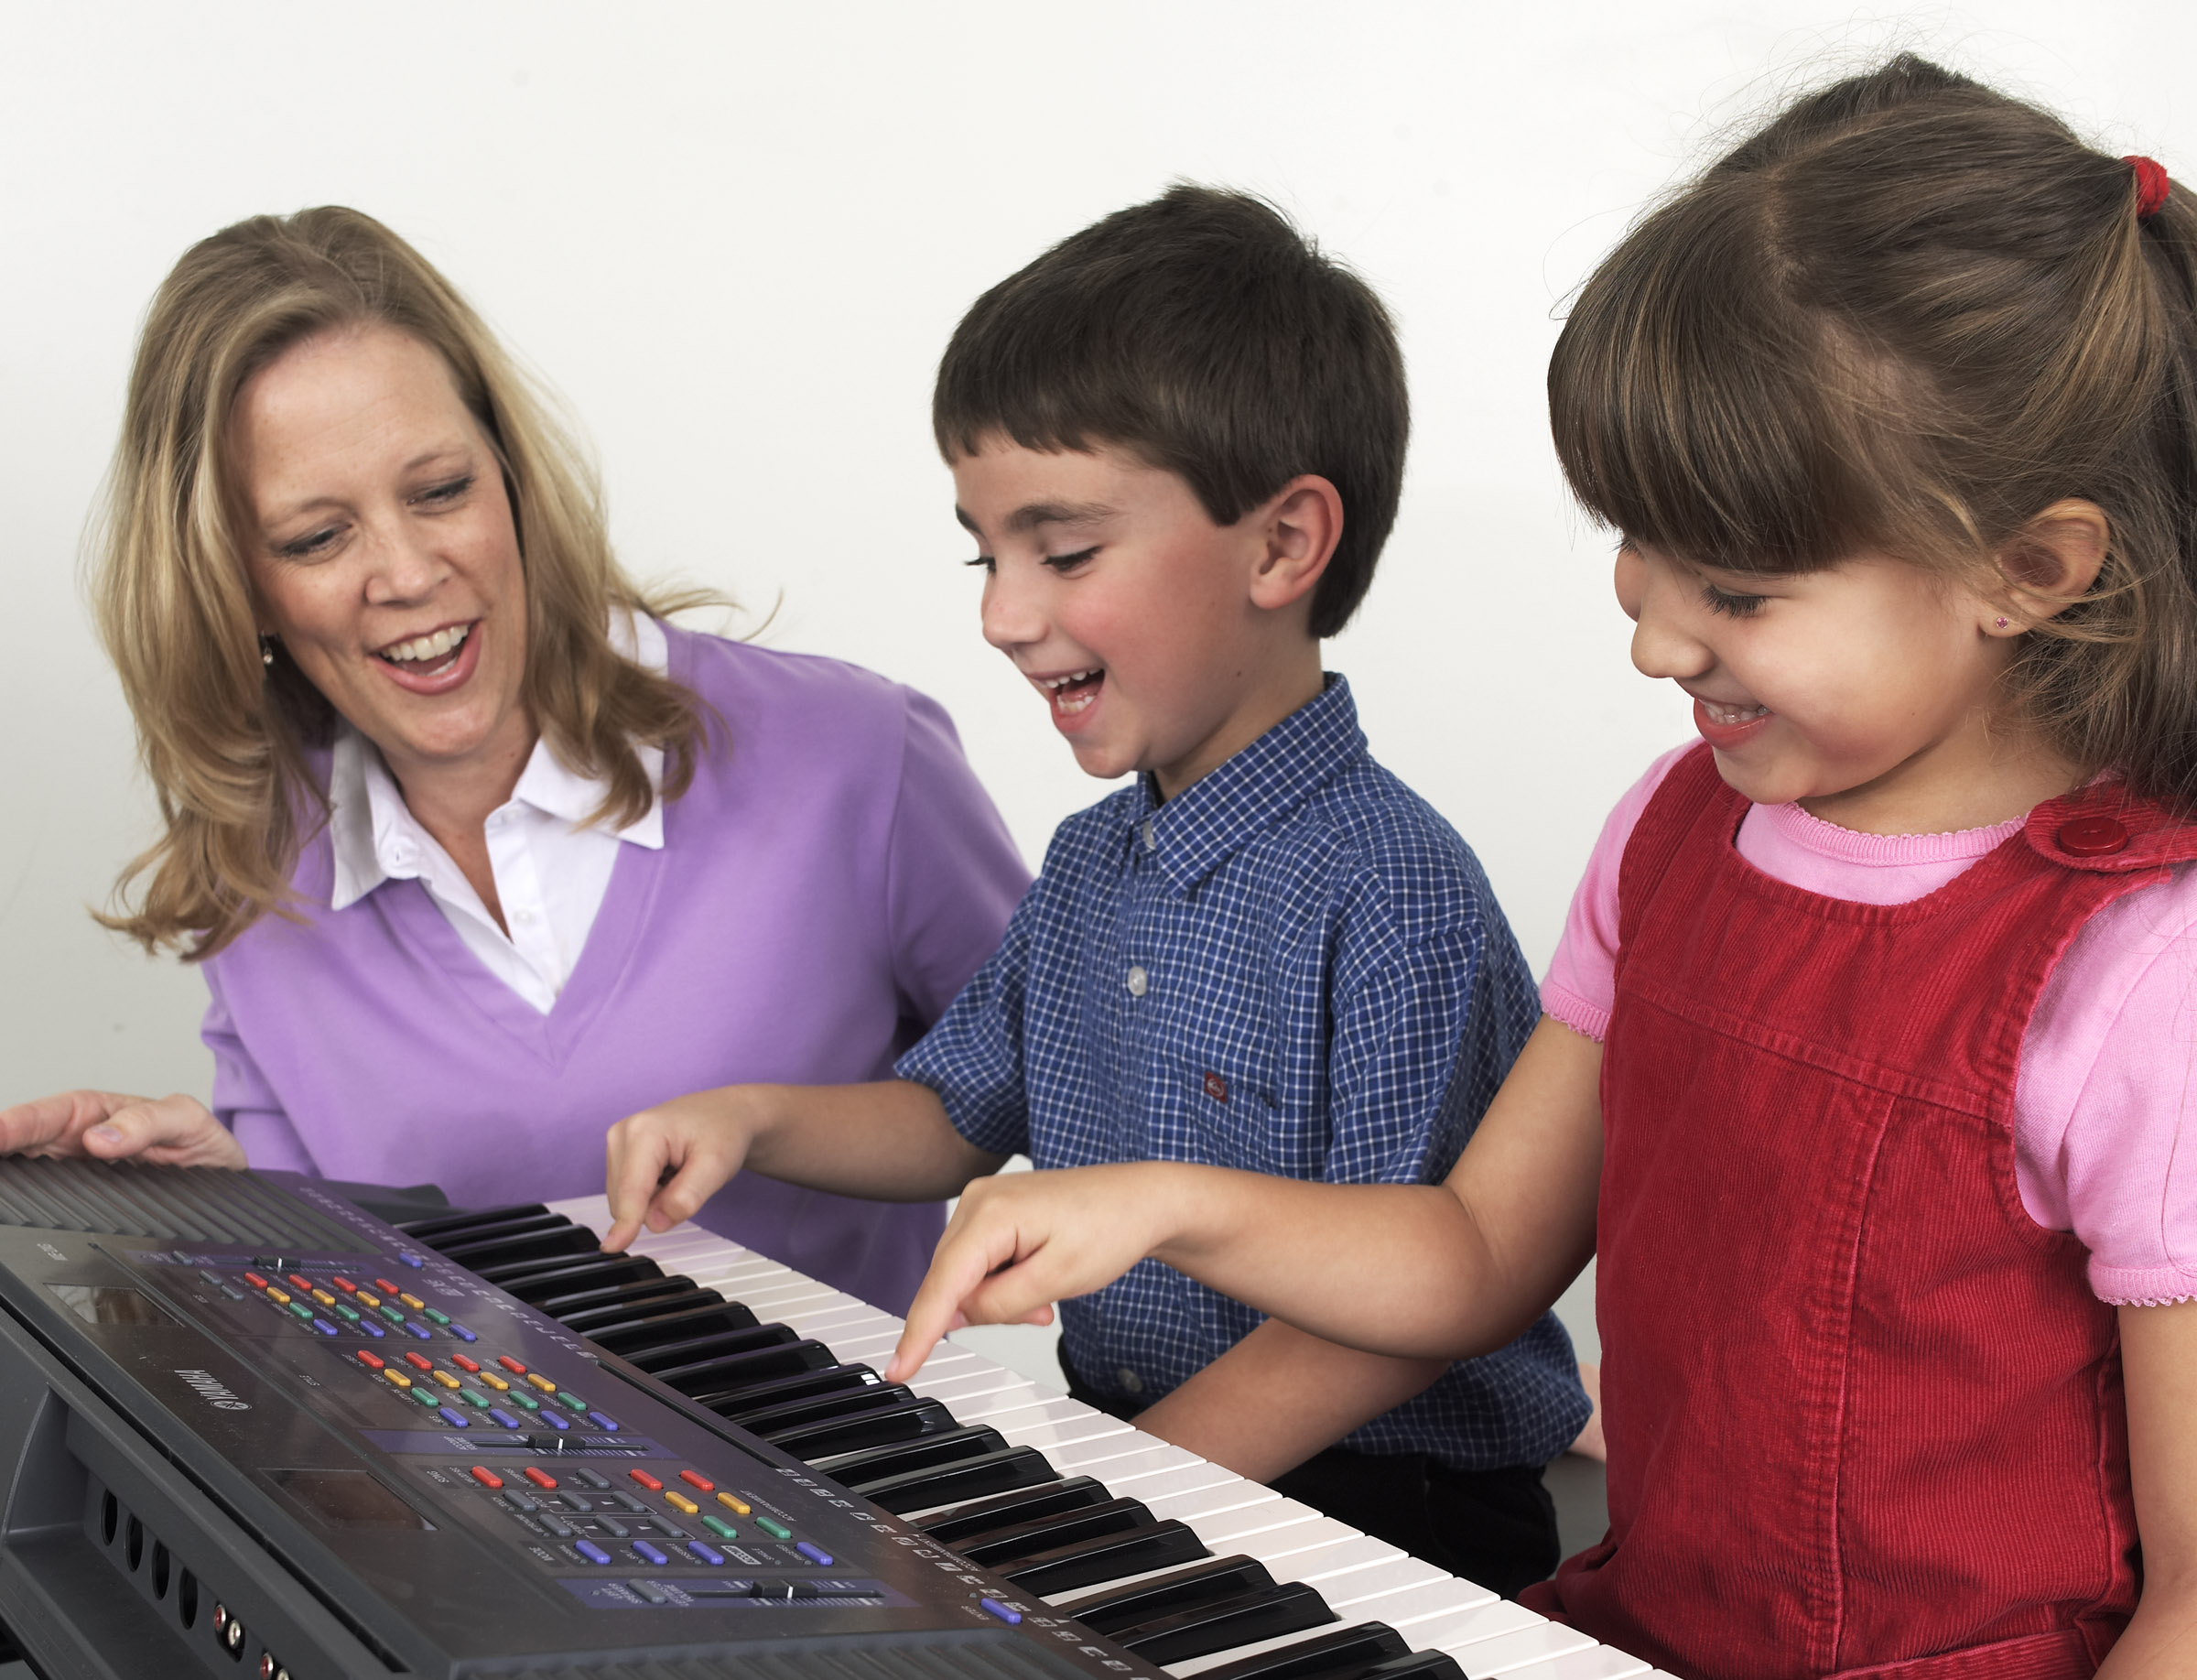 child childrens music school - HD2400×1835